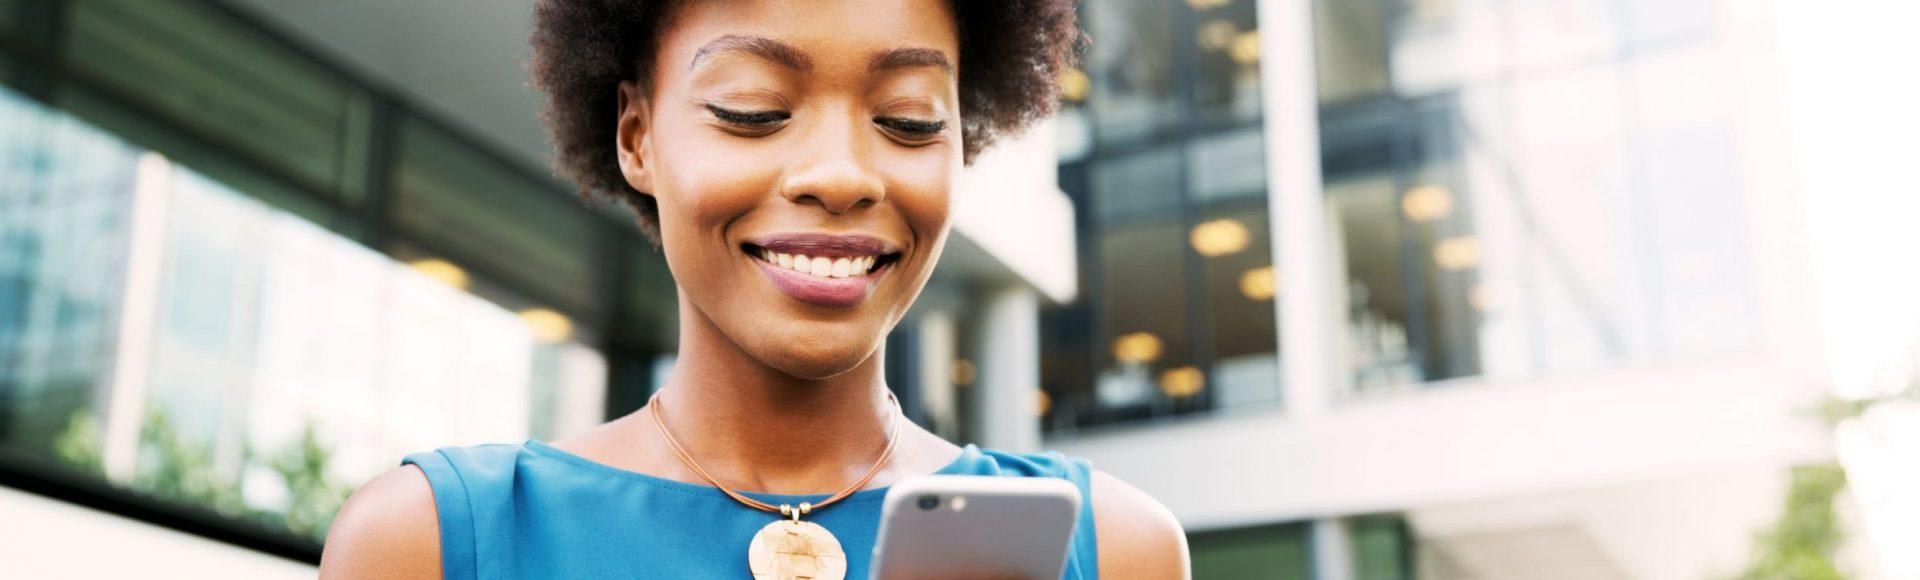 Une femme regarde un smartphone